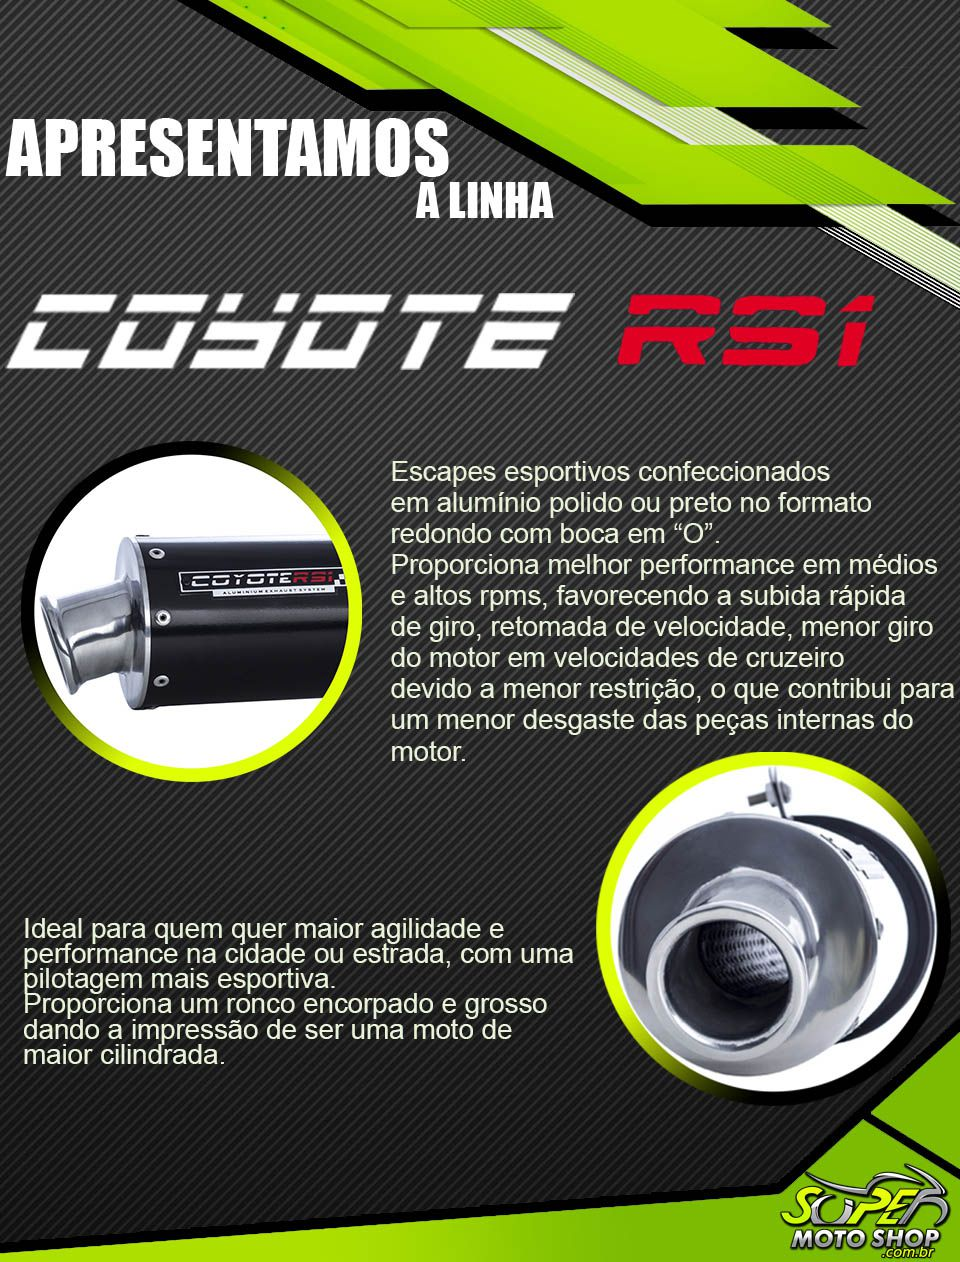 Escape / Ponteira Coyote RS1 Aluminio Redondo - Bandit 600 N - Suzuki